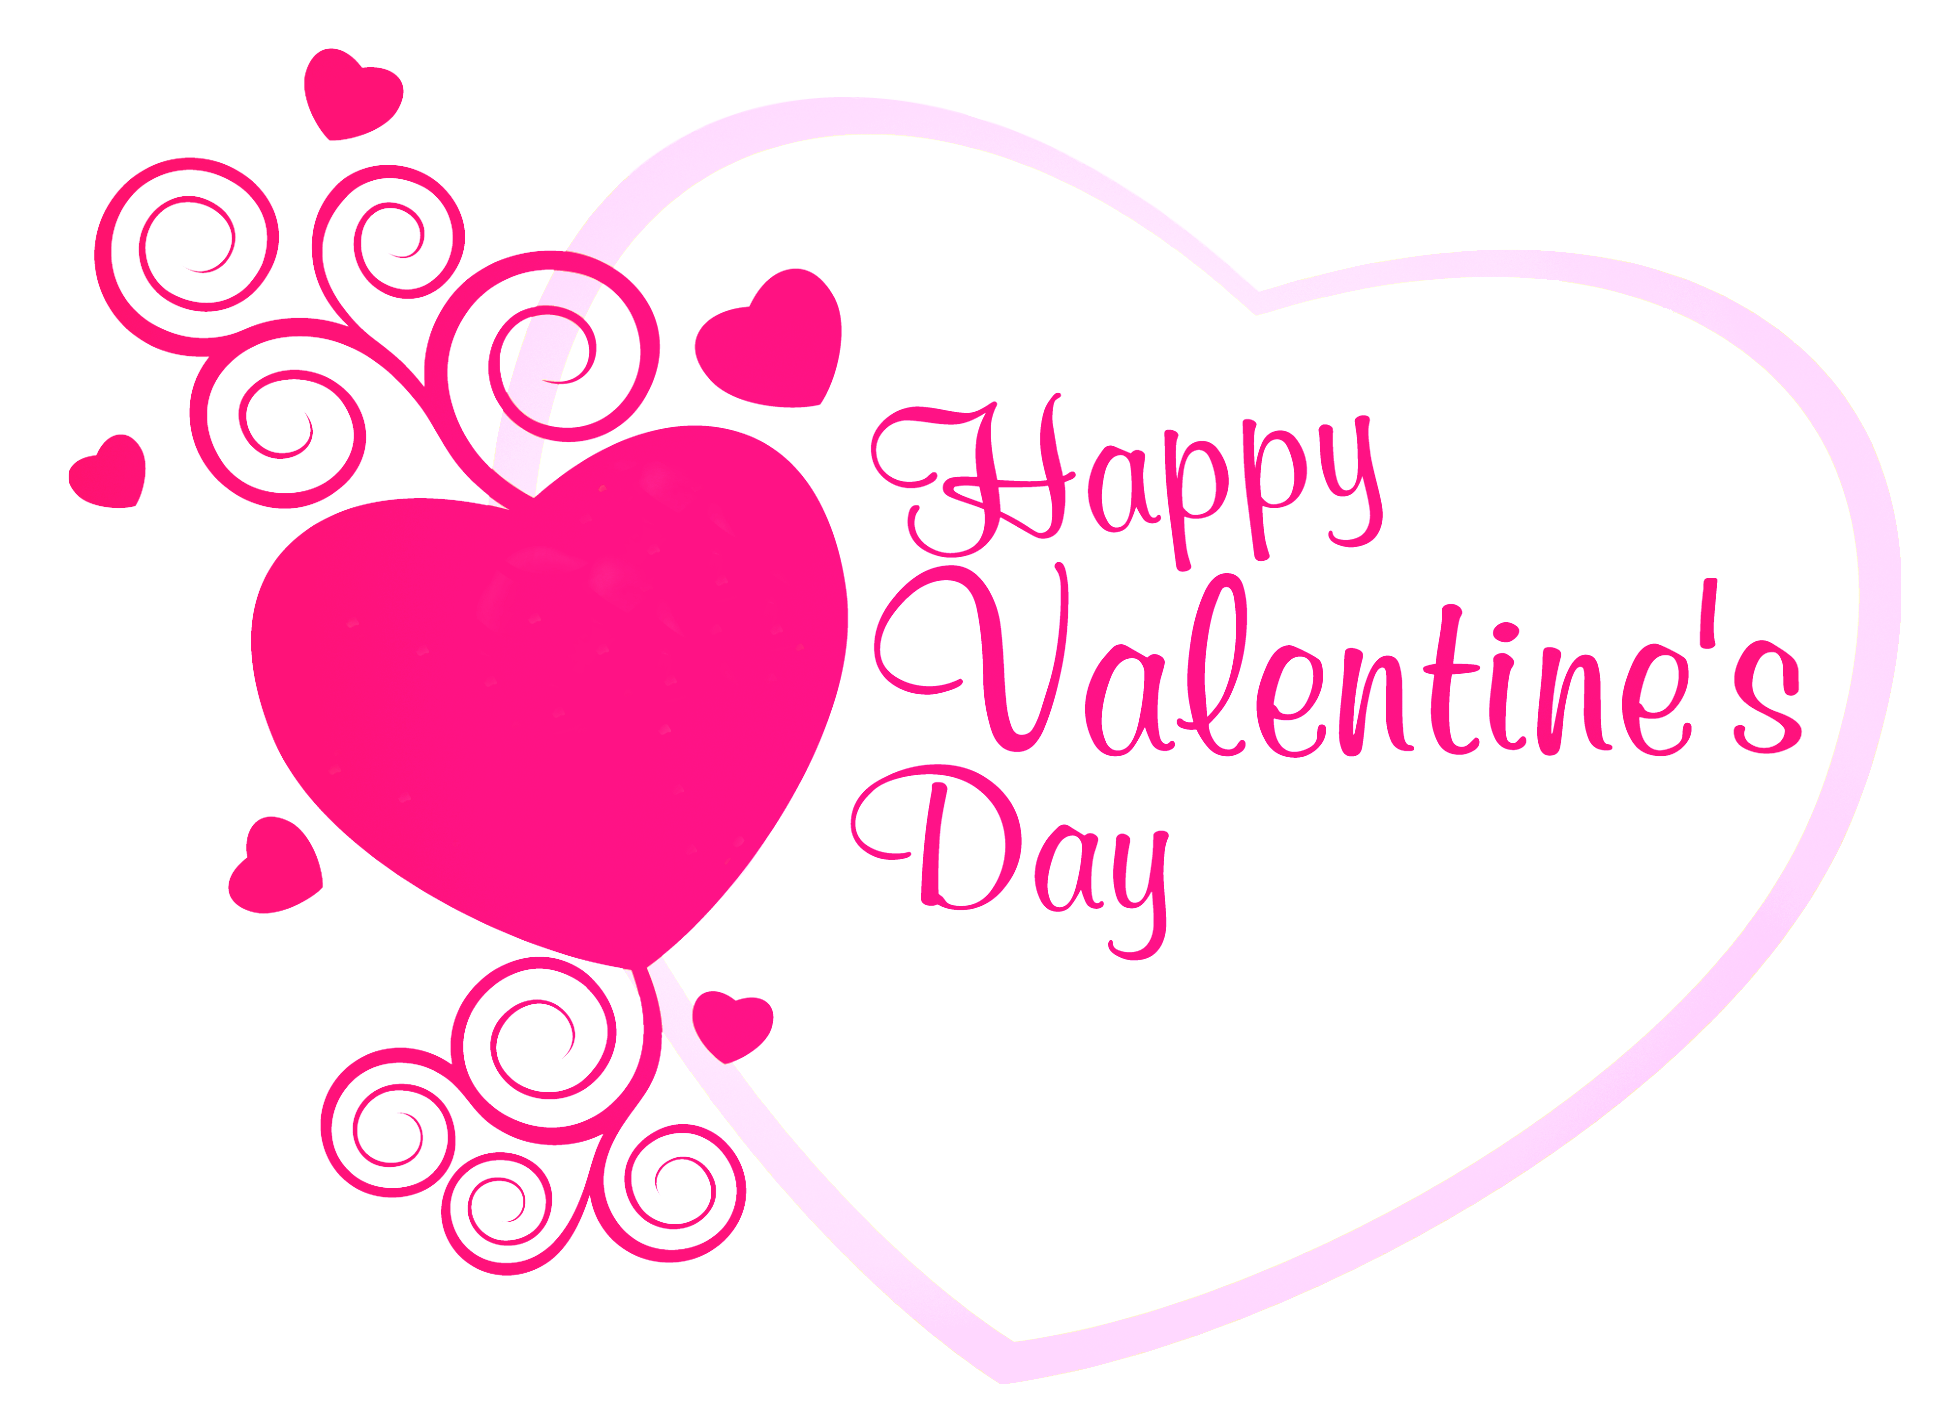 medium resolution of heart clipart valentine s day 3 valentines hearts happy valentines day wishes valentine cupcakes